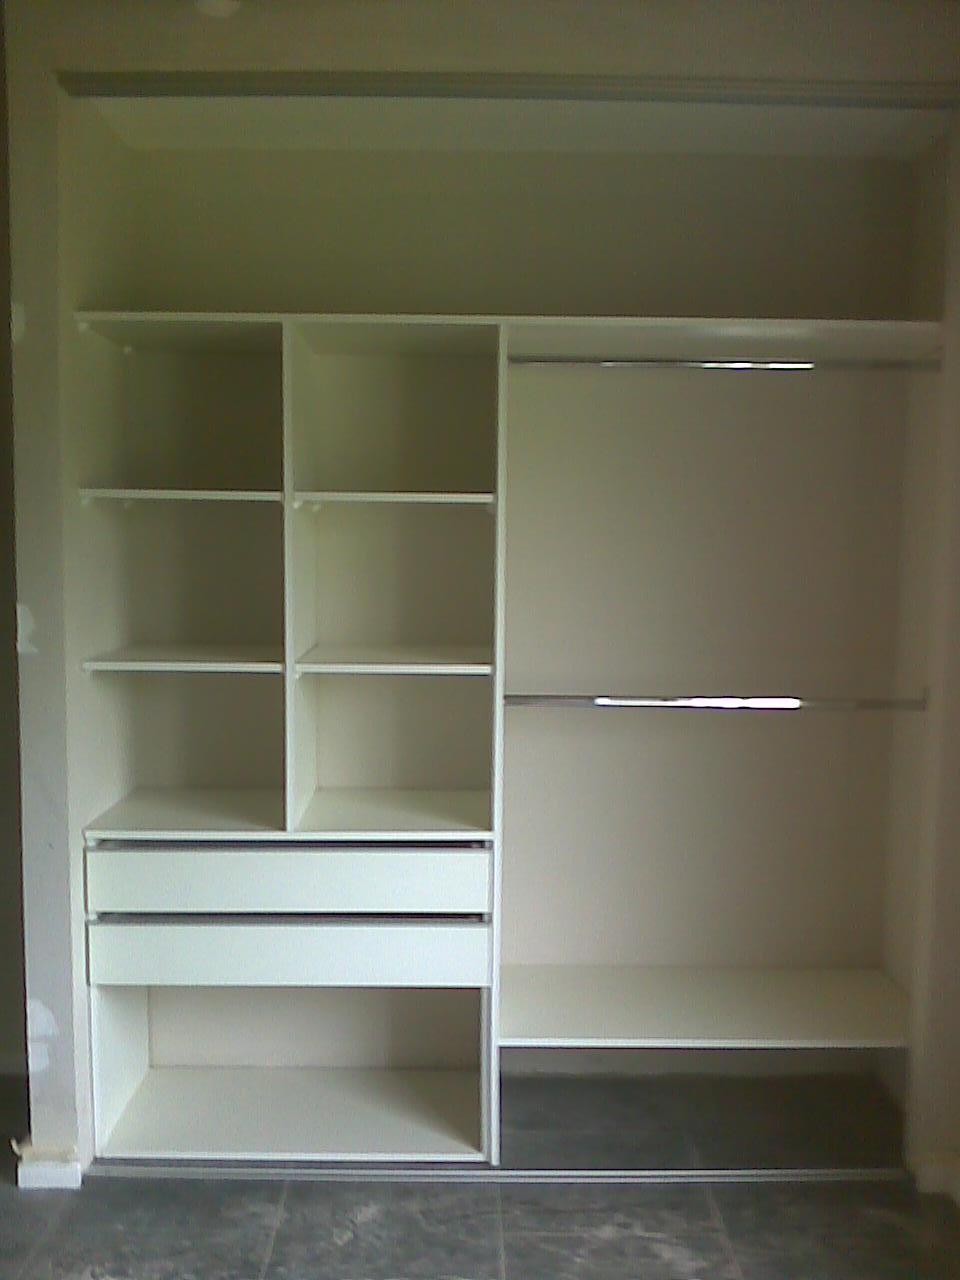 Muebles a medida tandil interiores para placard 2 mts 3 for Roperos de melamina para dormitorios